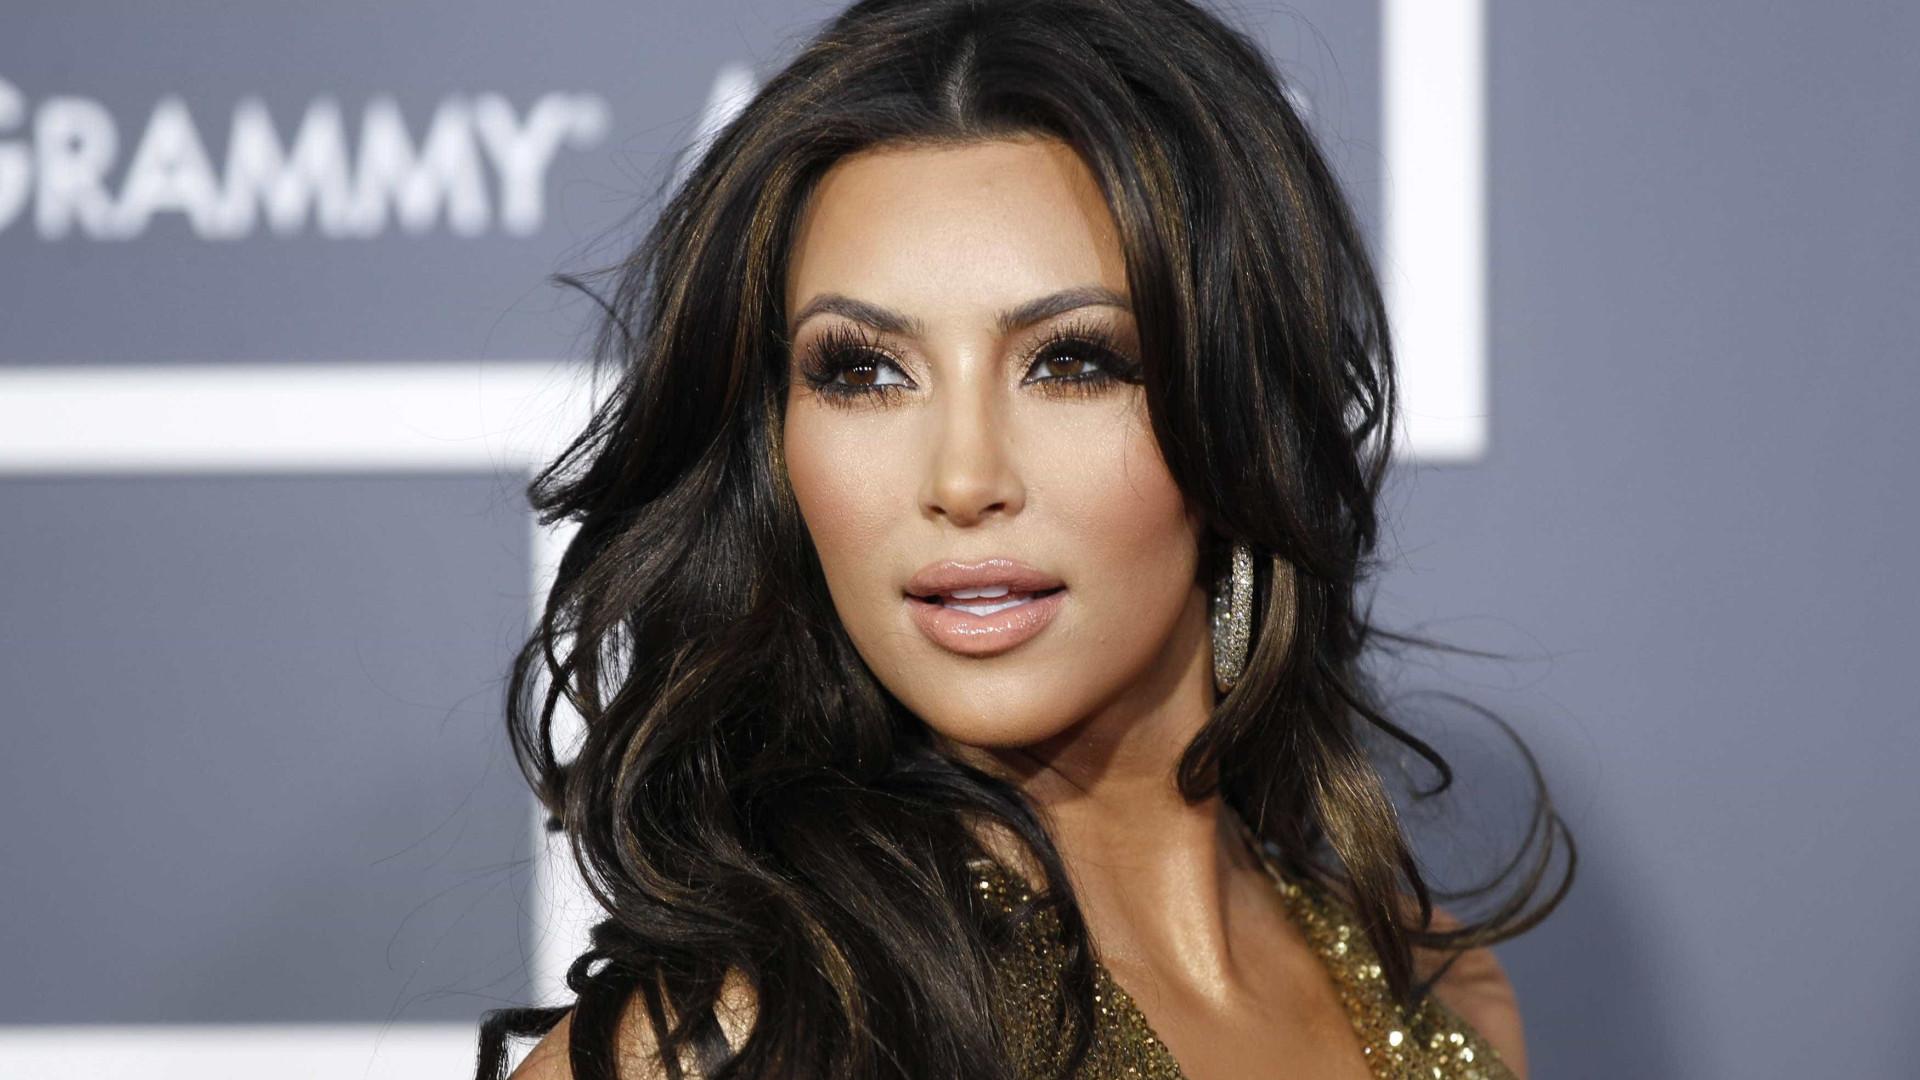 Após assalto, Kim irá celebrar o aniversário só com a família